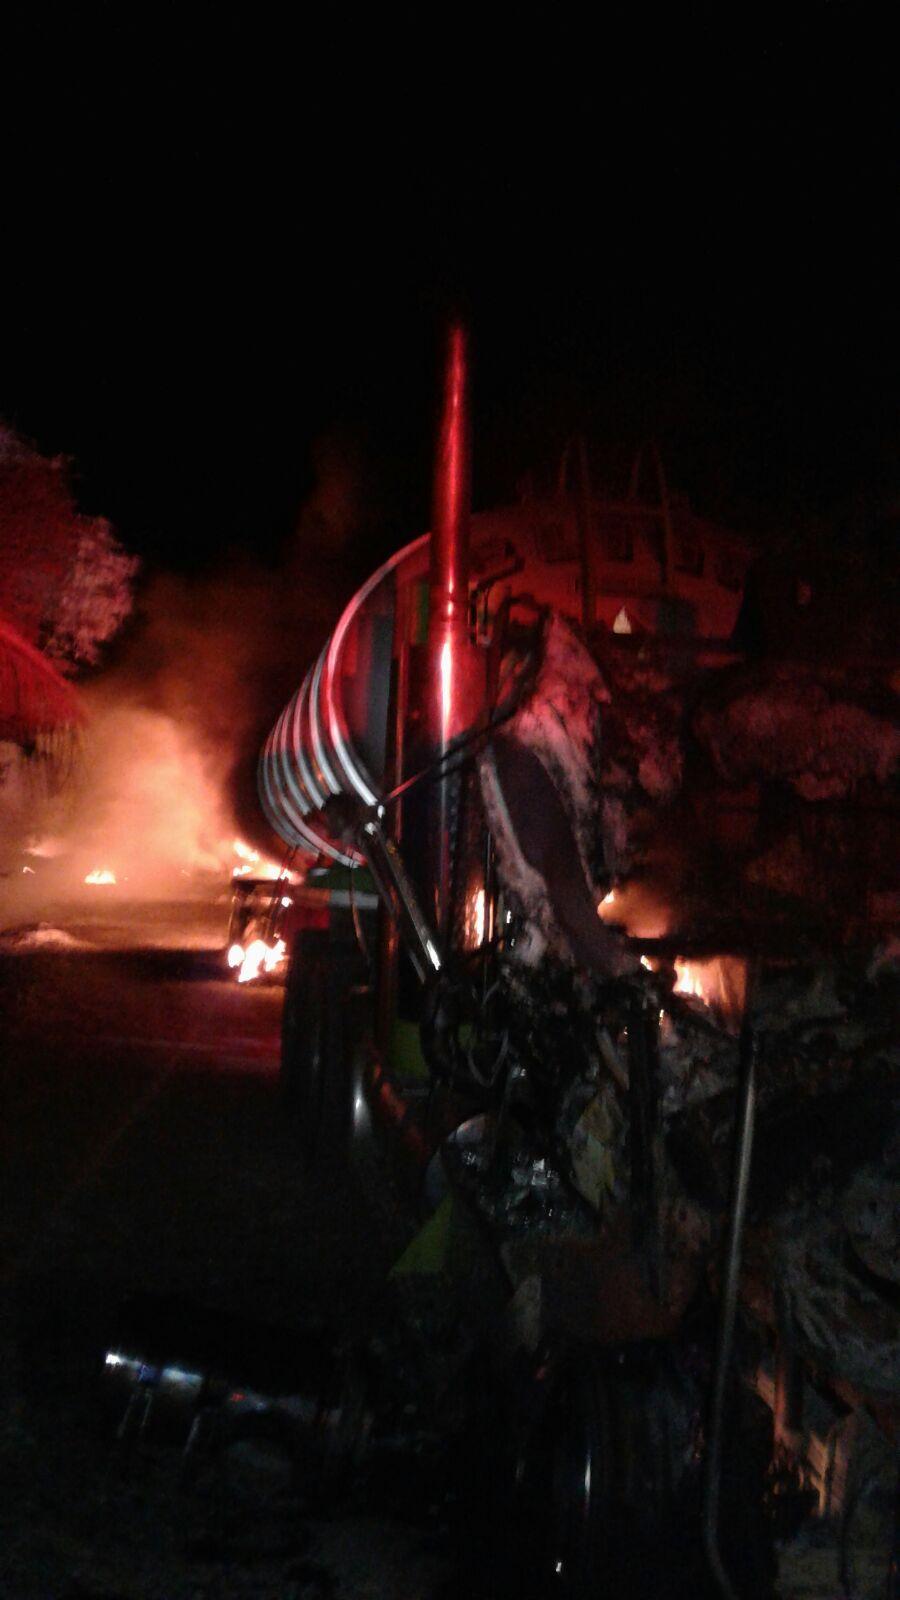 Dos carrotanques fueron incinerados anoche en zona rural de Paz de Ariporo.